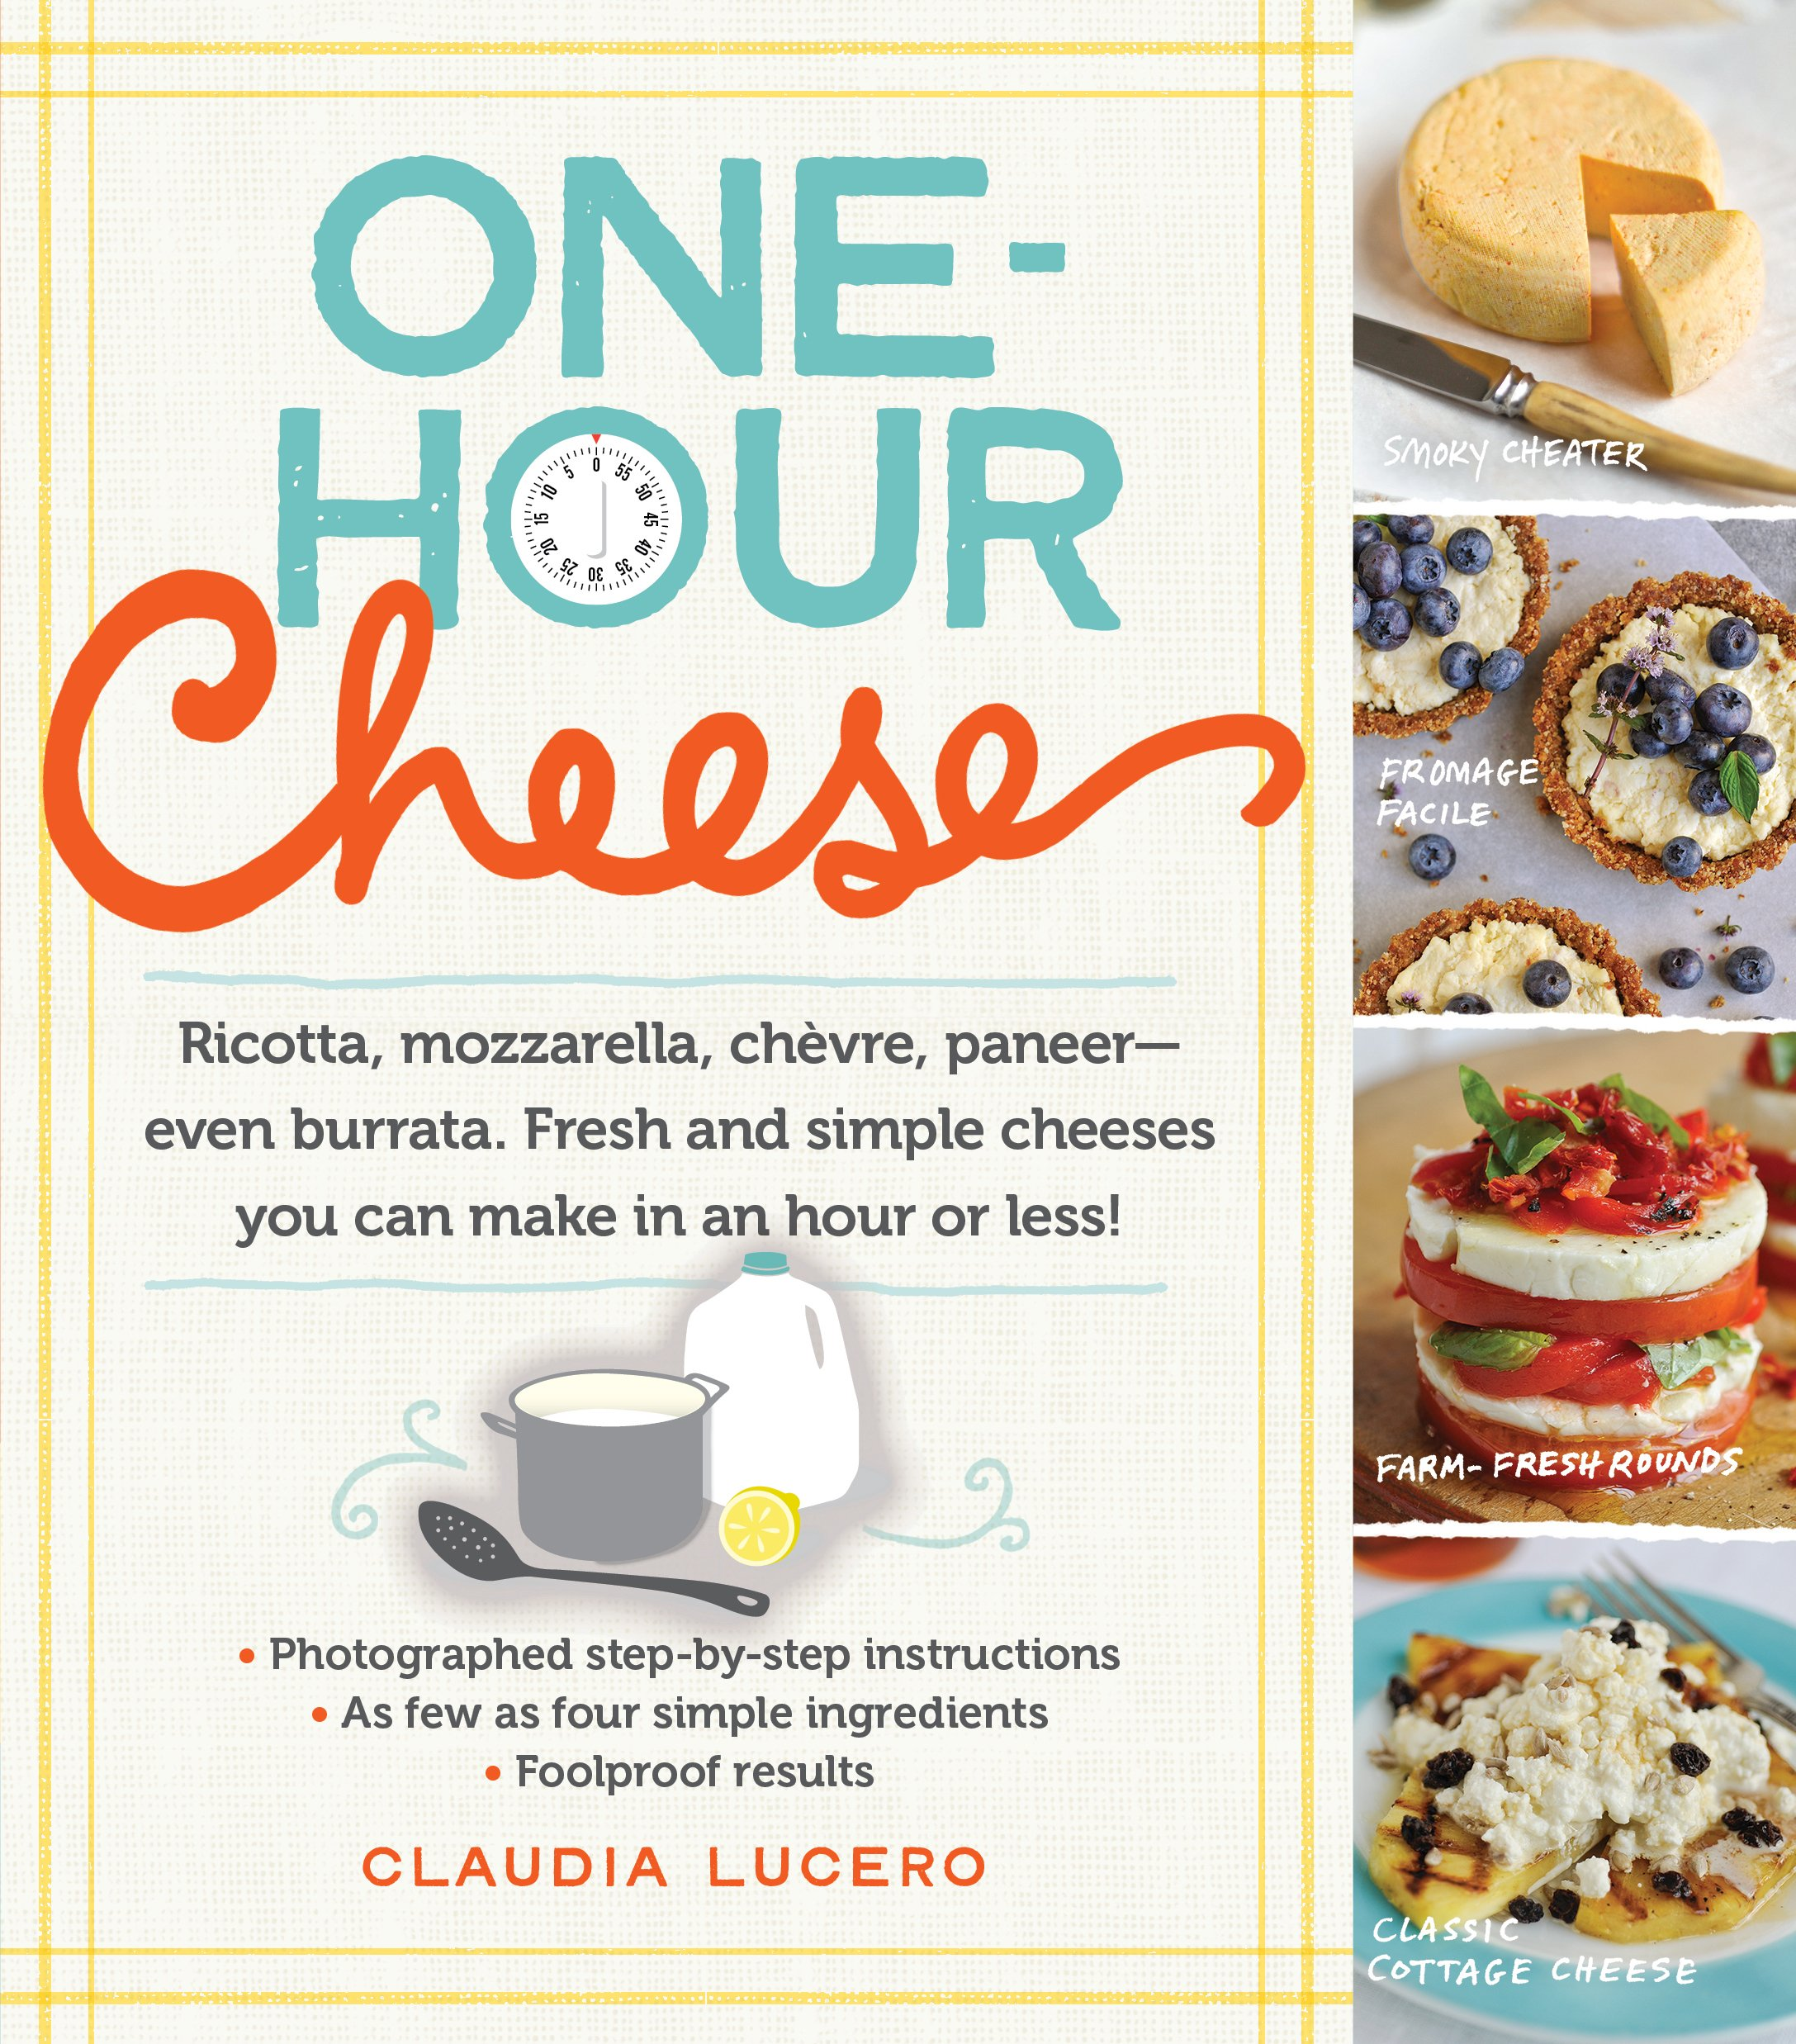 One Hour Cheese Mozzarella Paneer Even Burrata product image